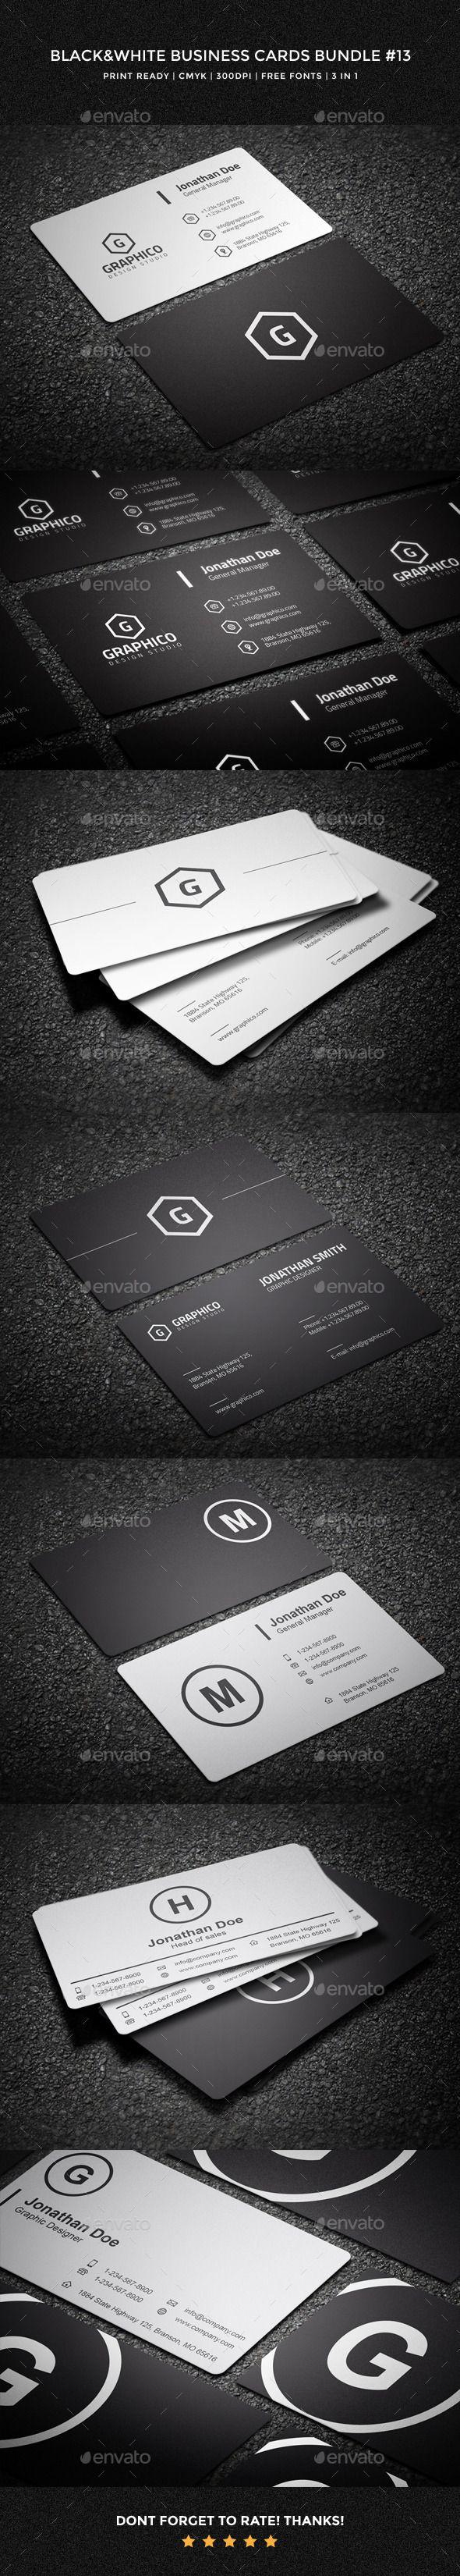 243 best business card inspiration images on pinterest